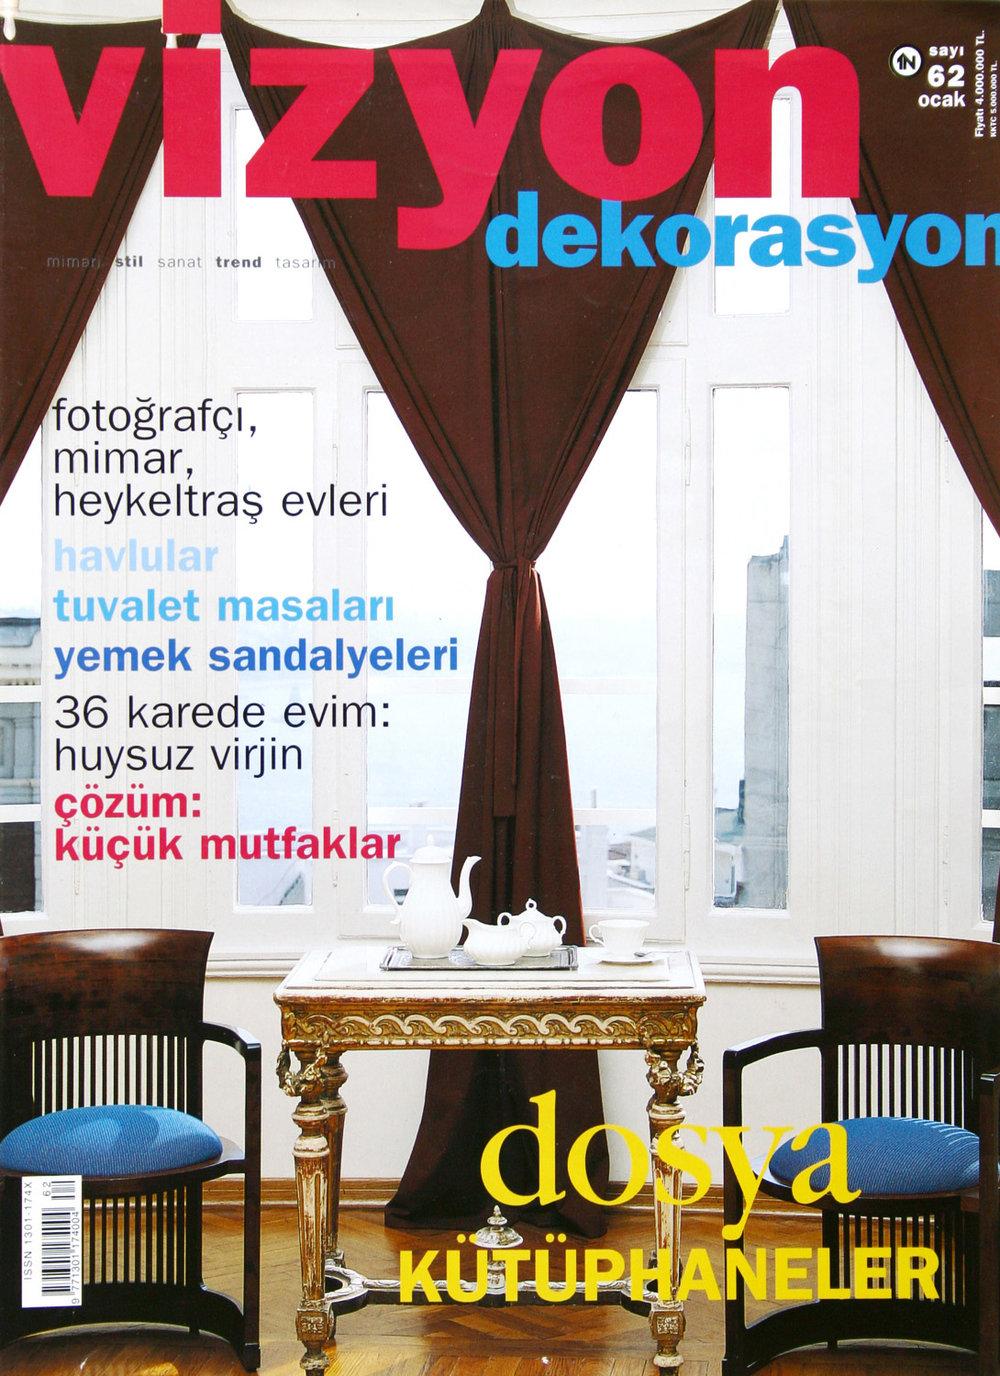 HulyaKolabas-NewYork_interior_Architecture_Photographer_001852.jpg